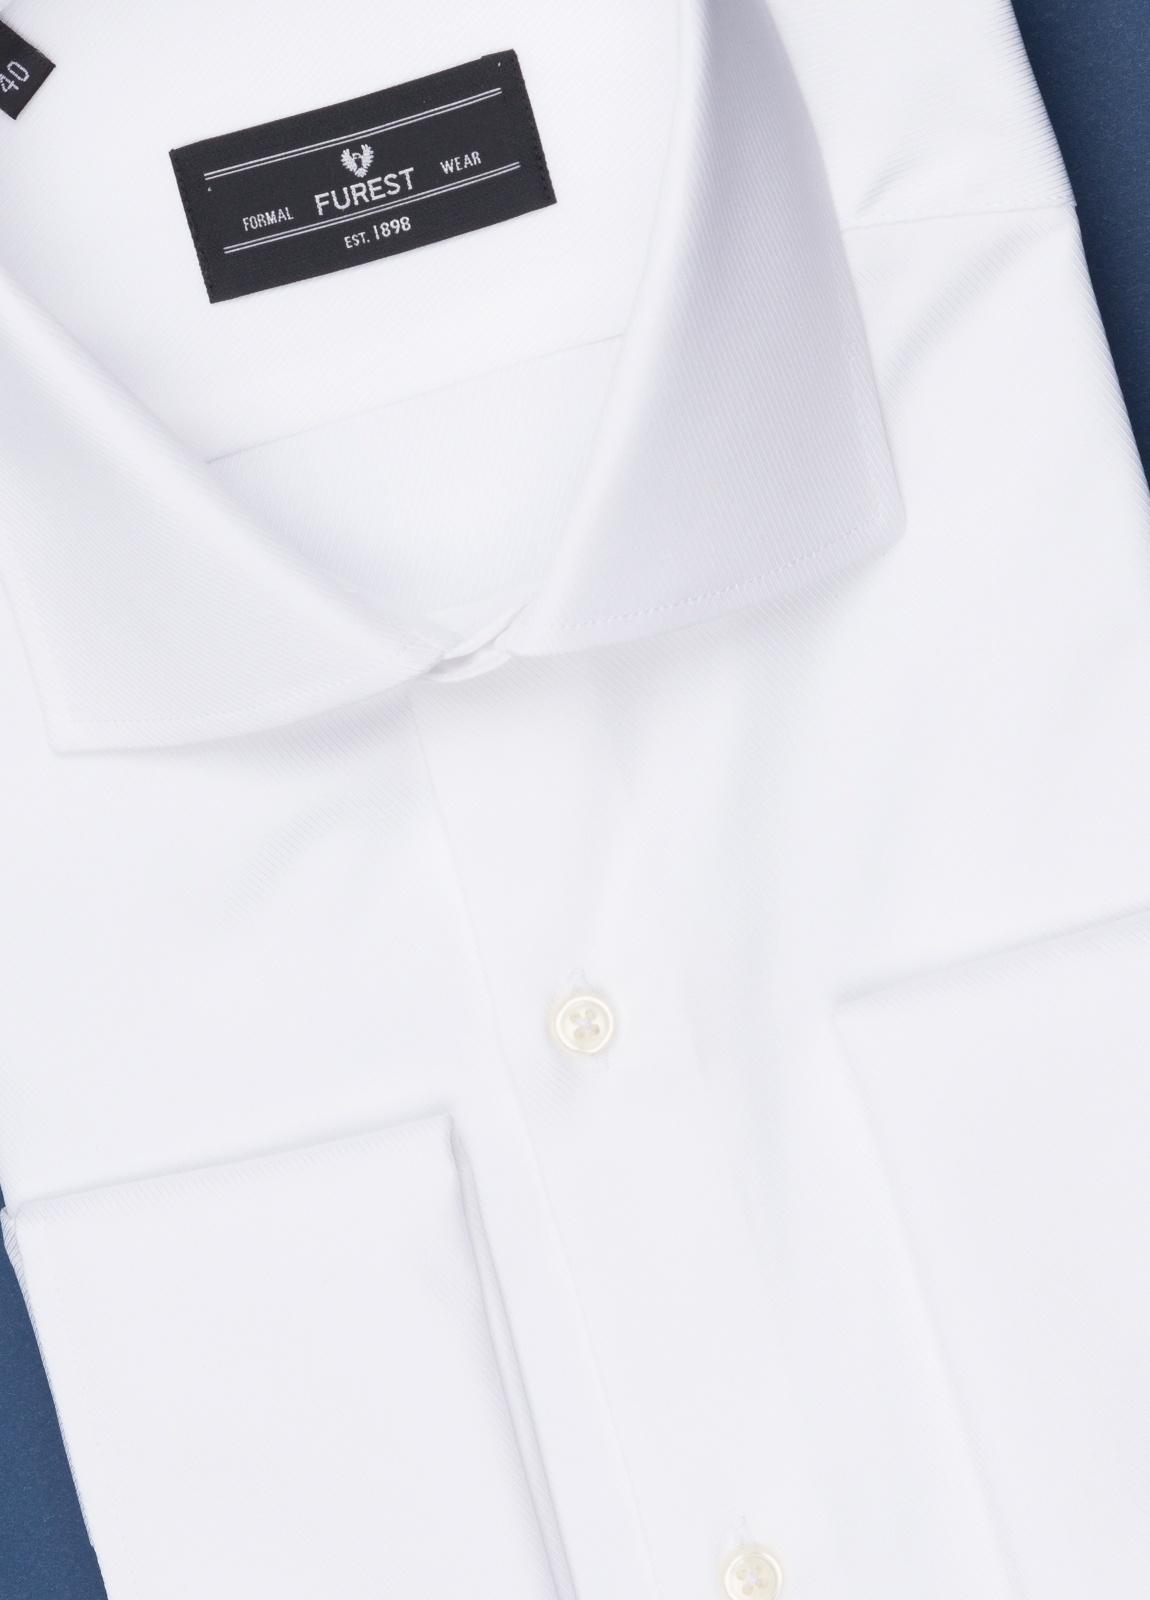 Camisa vestir FUREST COLECCIÓN Slim Fit Puño Doble otoman blanco - Ítem1